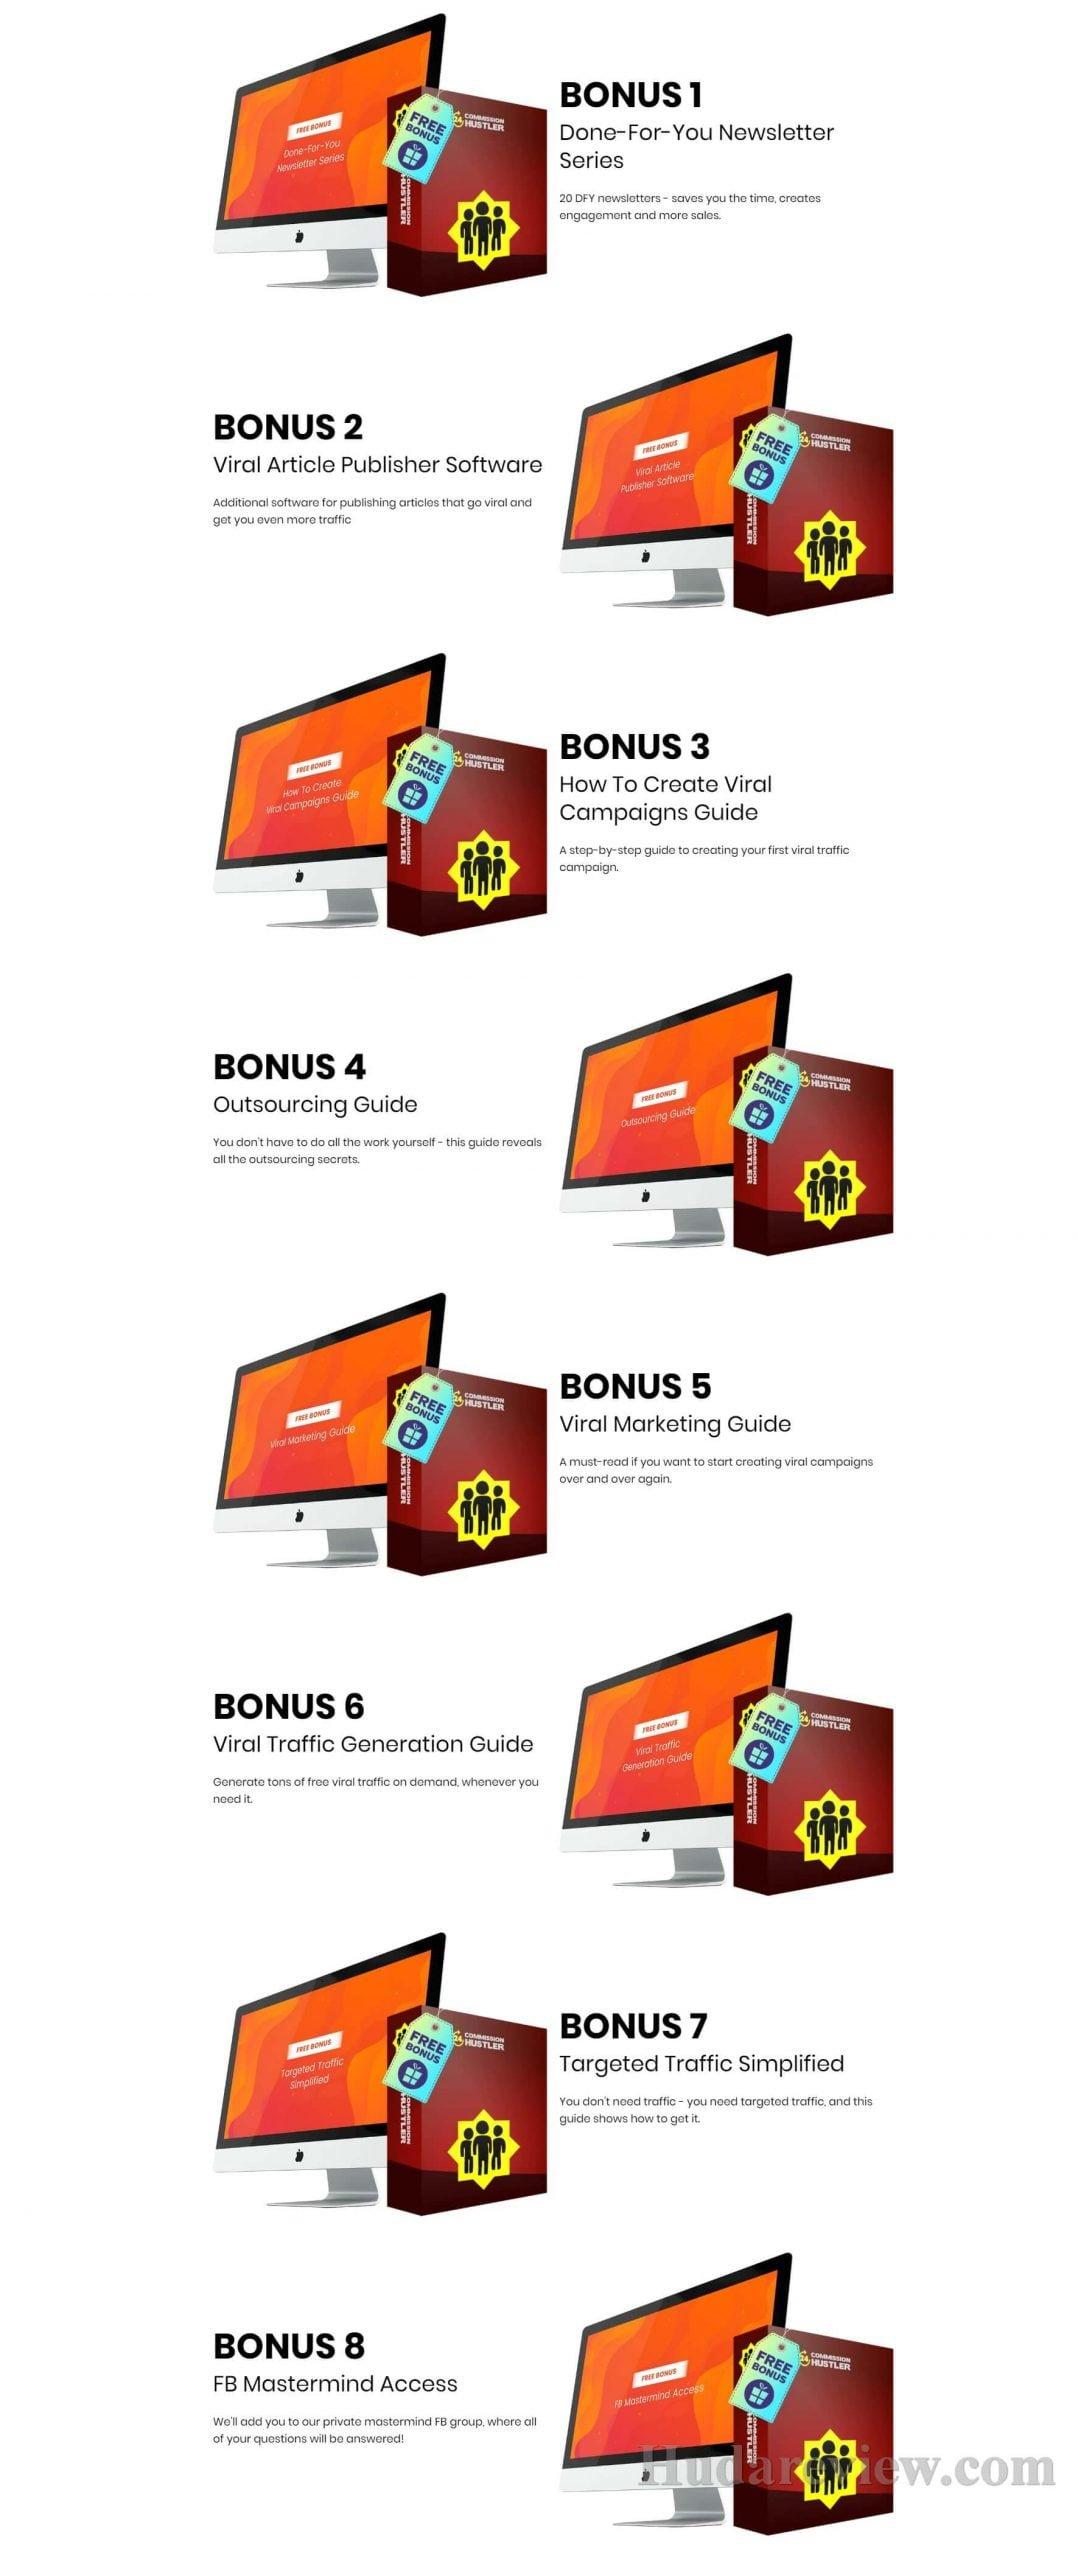 24h-Commission-Hustler-Review-Bonuses